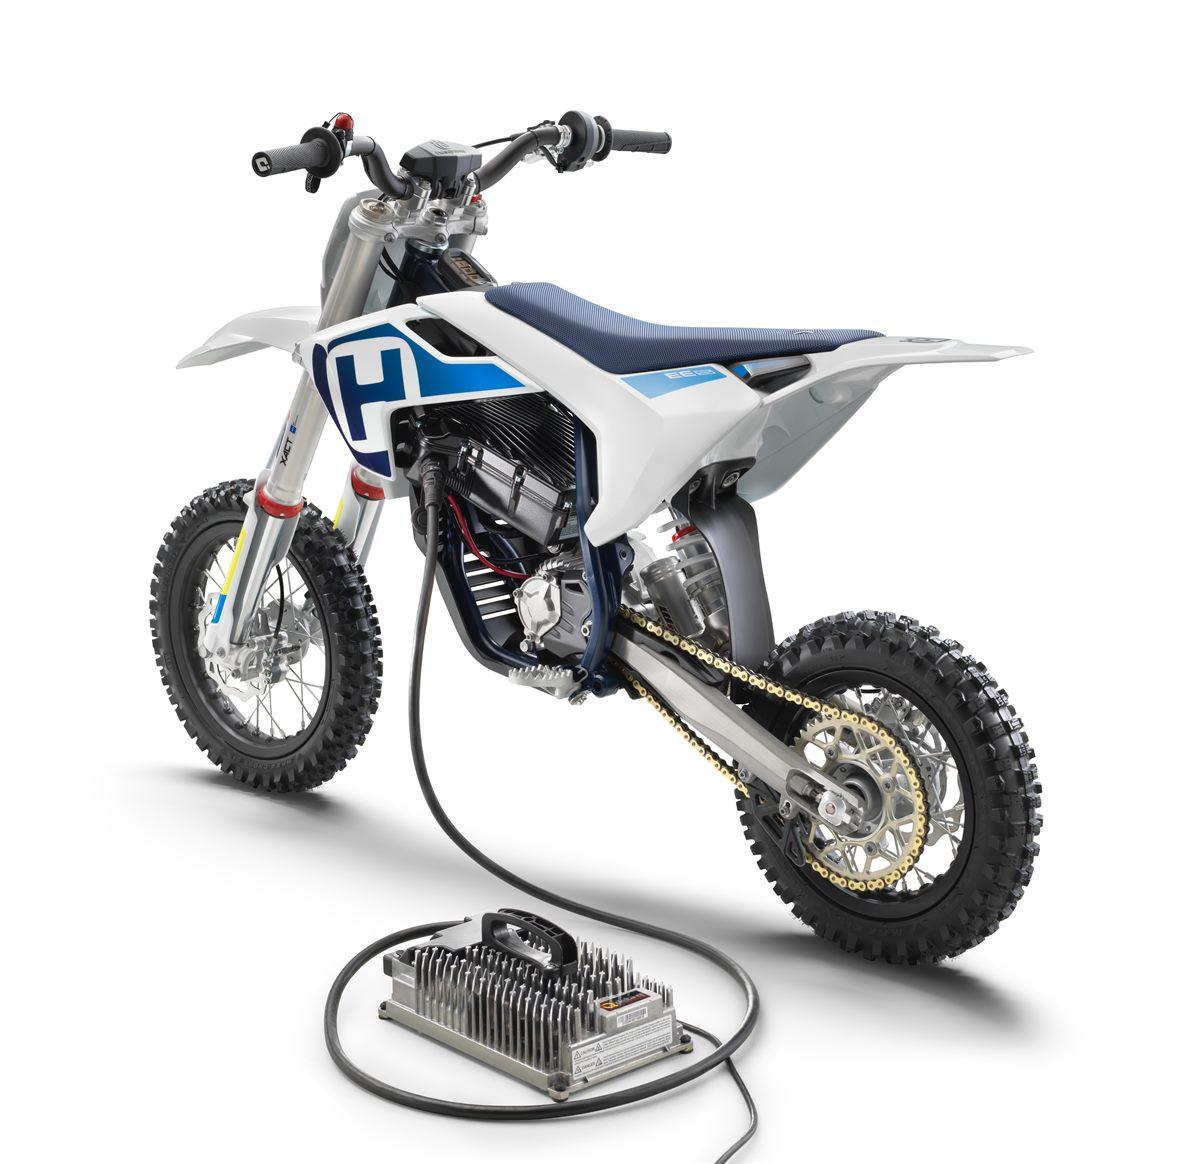 Husqvarna Motorcycles EE 5